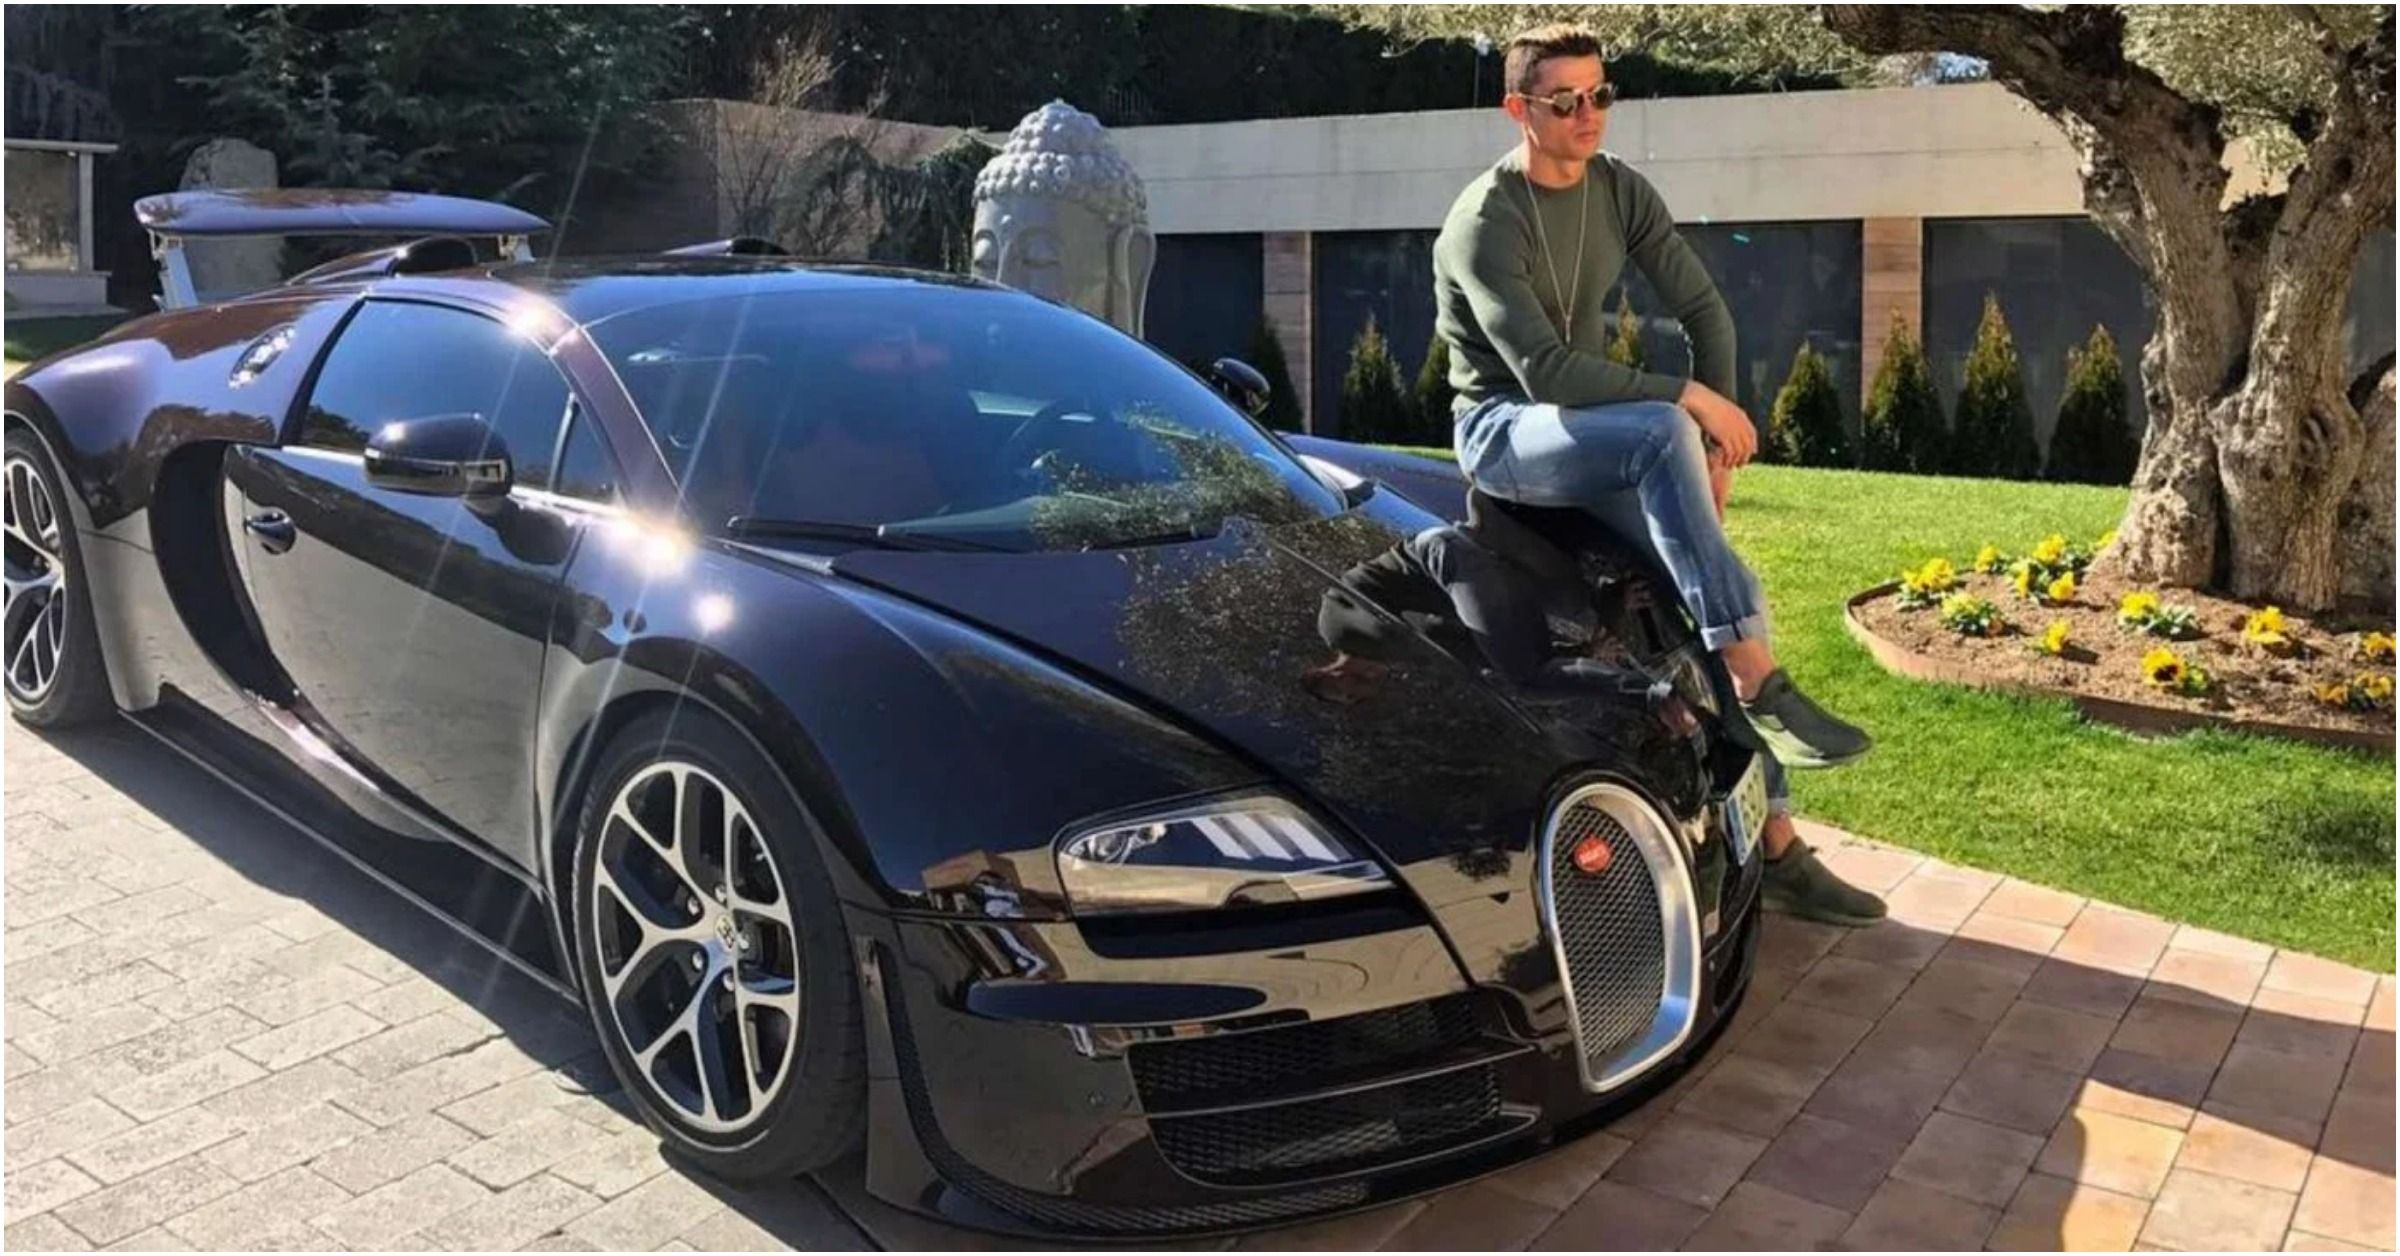 15 Most Insane Cars In Cristiano Ronaldo's Car Collection